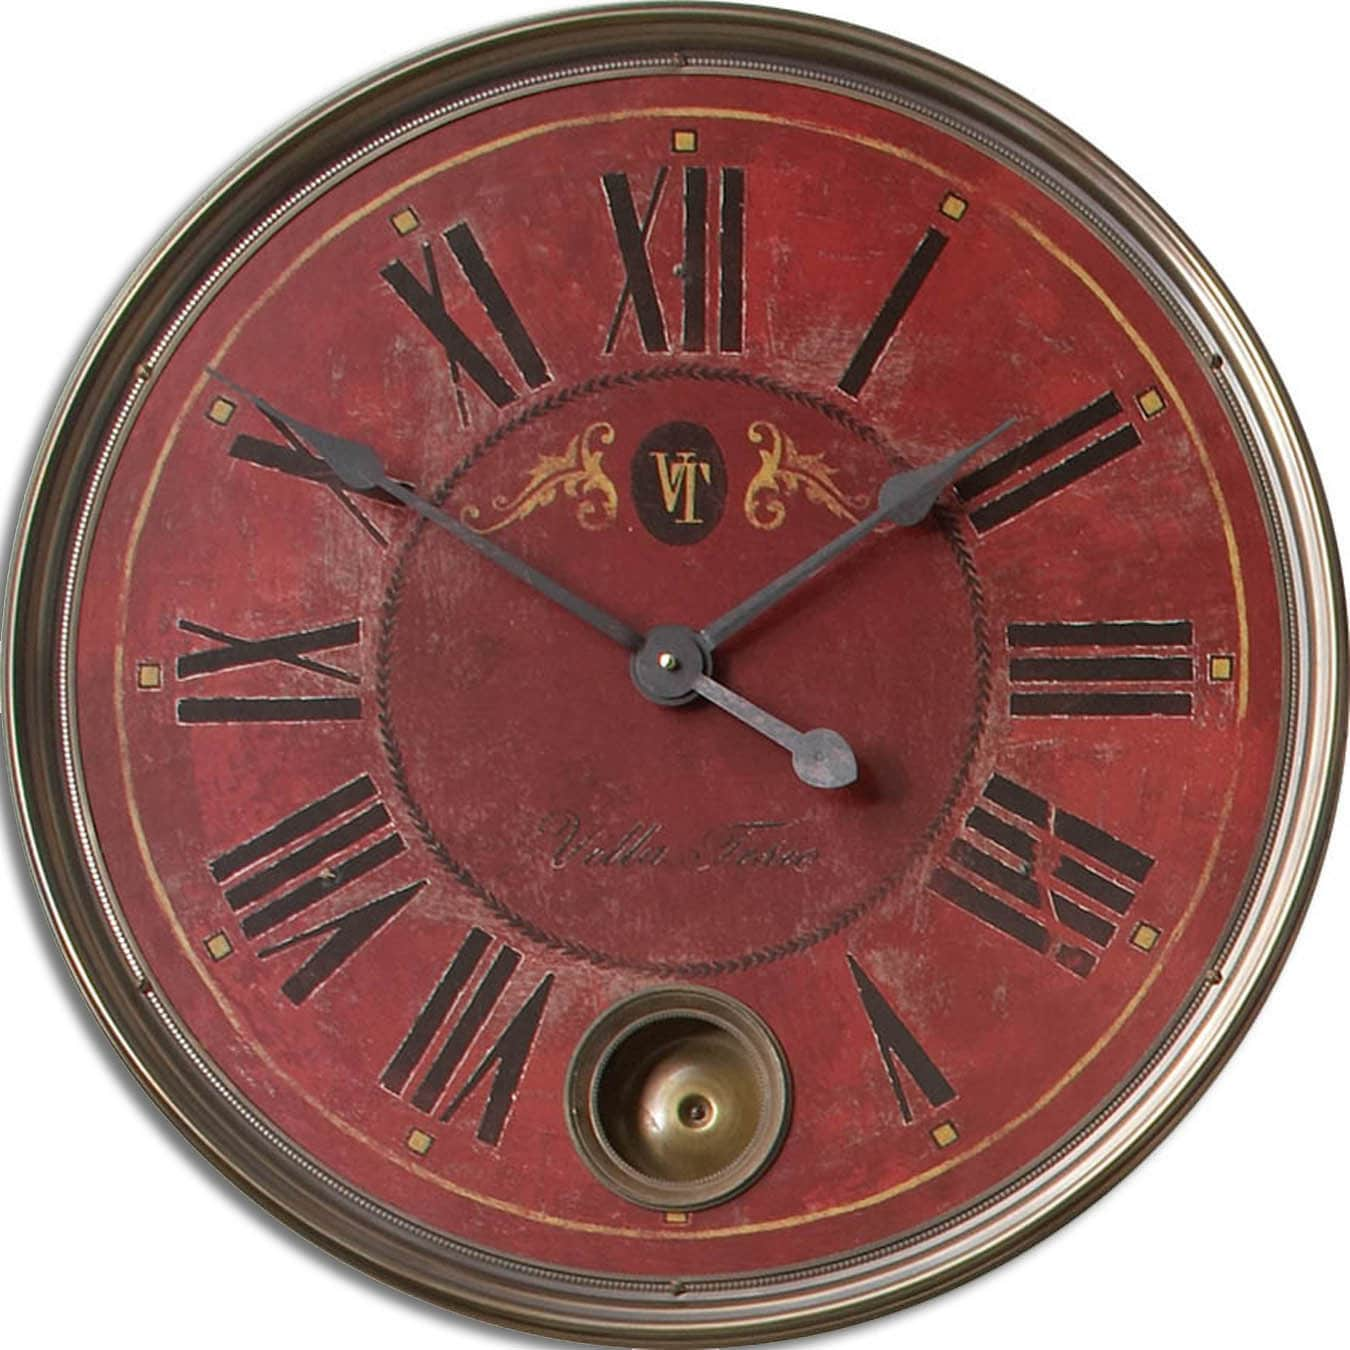 Overstock.com Regency 'Villa Tesio' Distressed Red Wall Clock at Sears.com